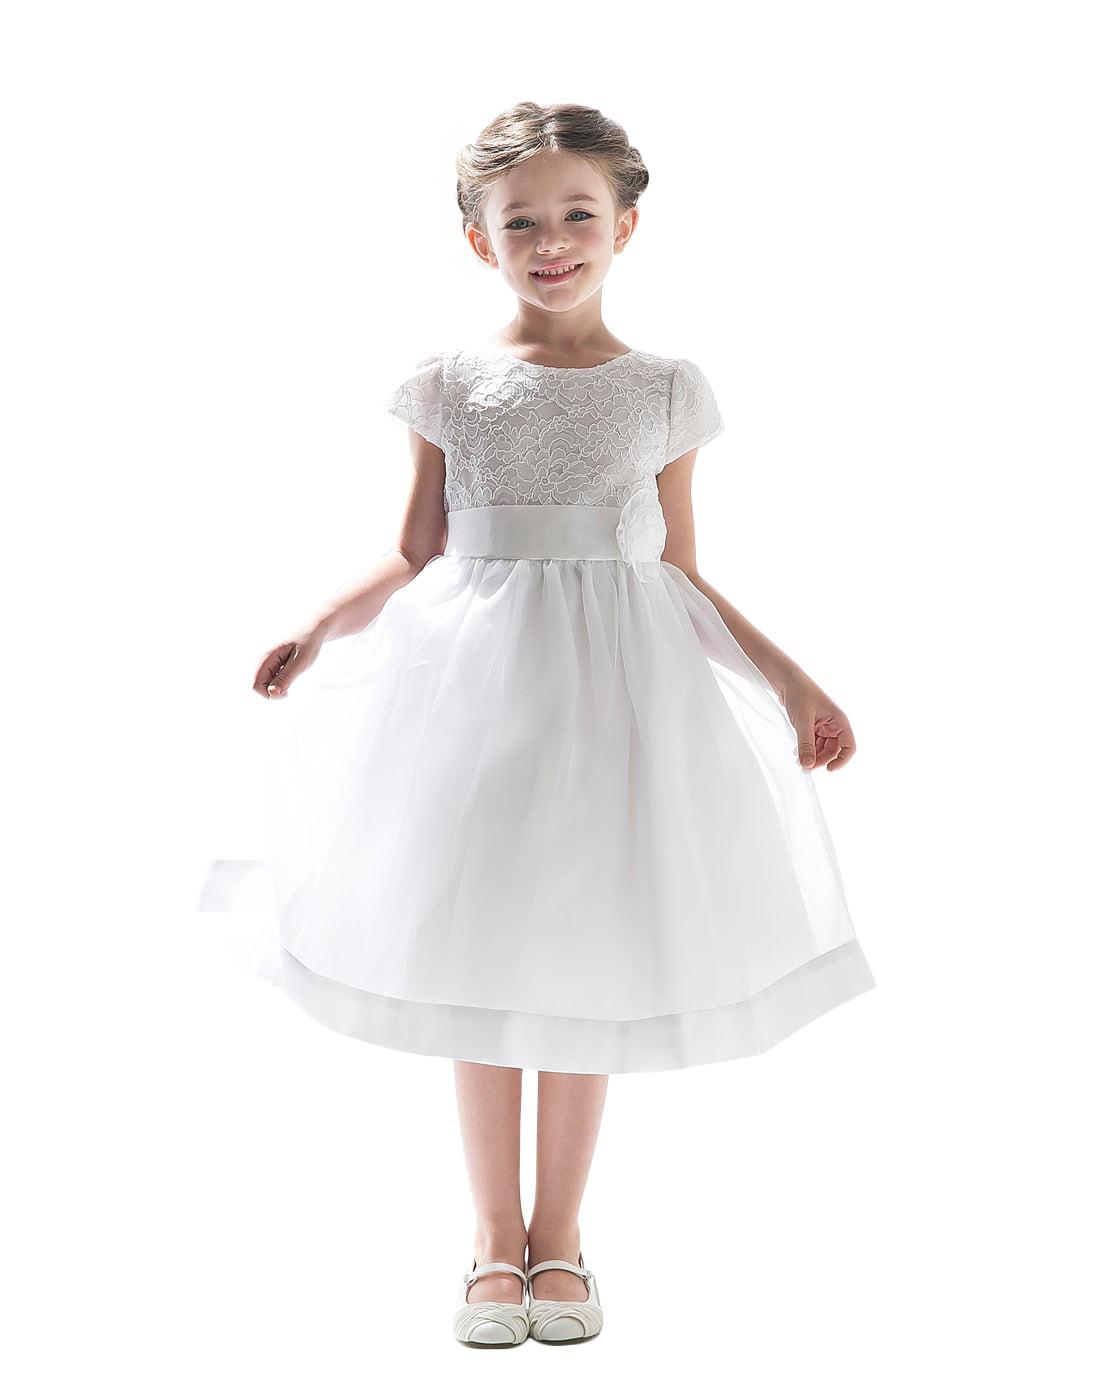 Efavormart Attractive Lace and Mirror Organza Dress with a Satin Blossom Birthday Girl Dress Junior Flower Girl Wedding Girls Dress